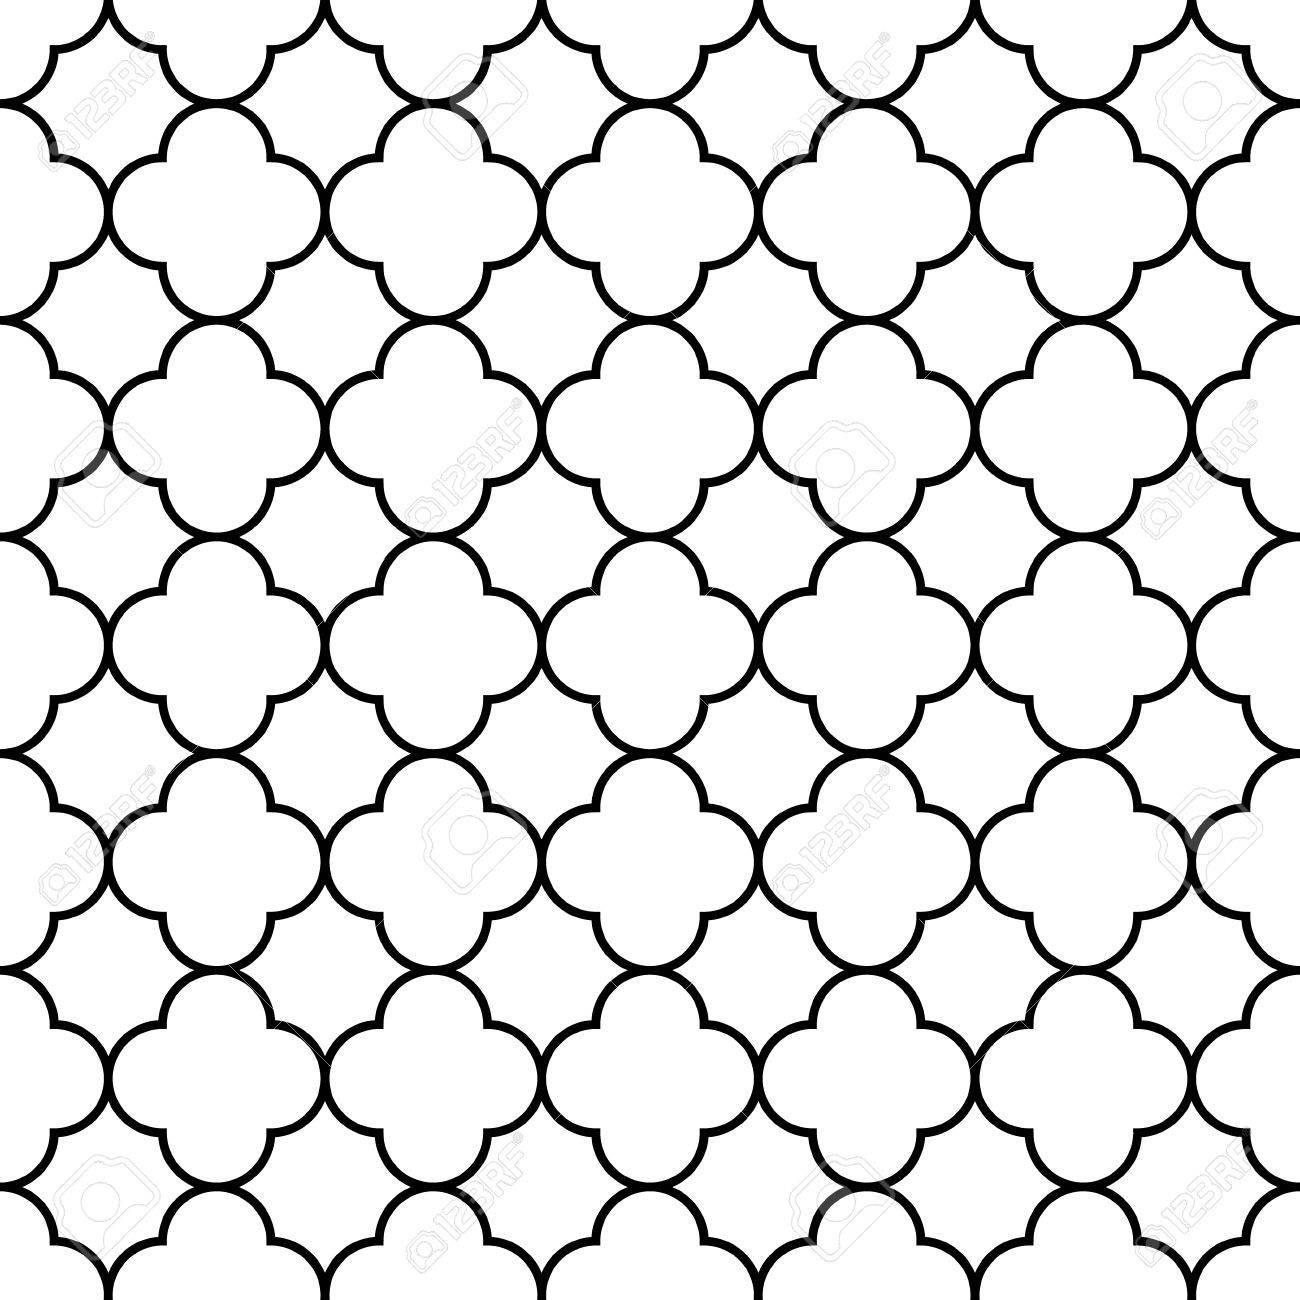 Black and white arabic traditional geometric quatrefoil seamless pattern - 58976996